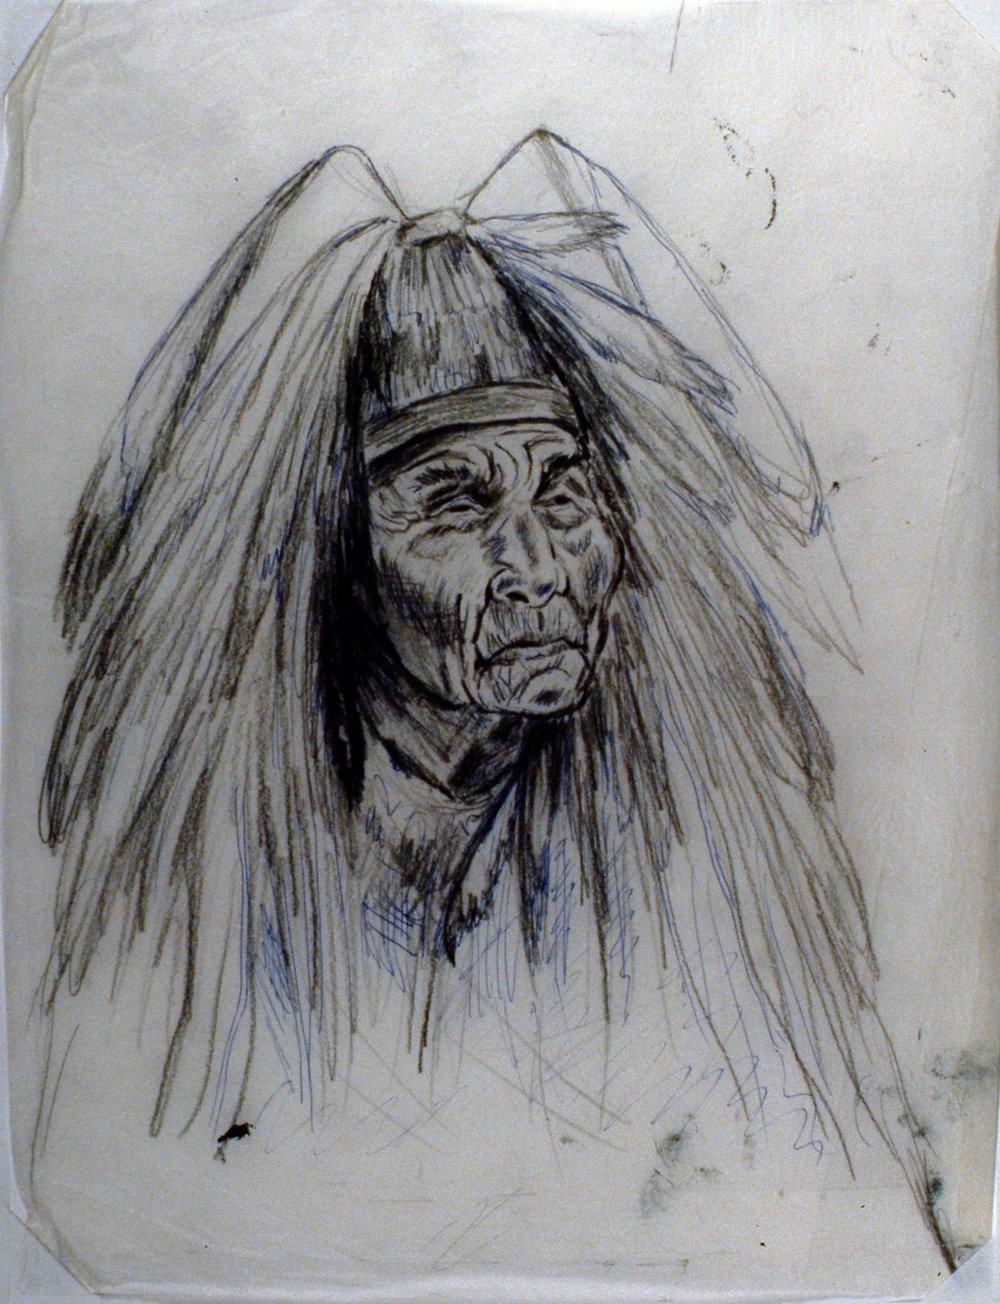 Shaman - August Jack, 1980, Minn Sjløseth, sketch, 25 x 20 cm, 1996.02.07